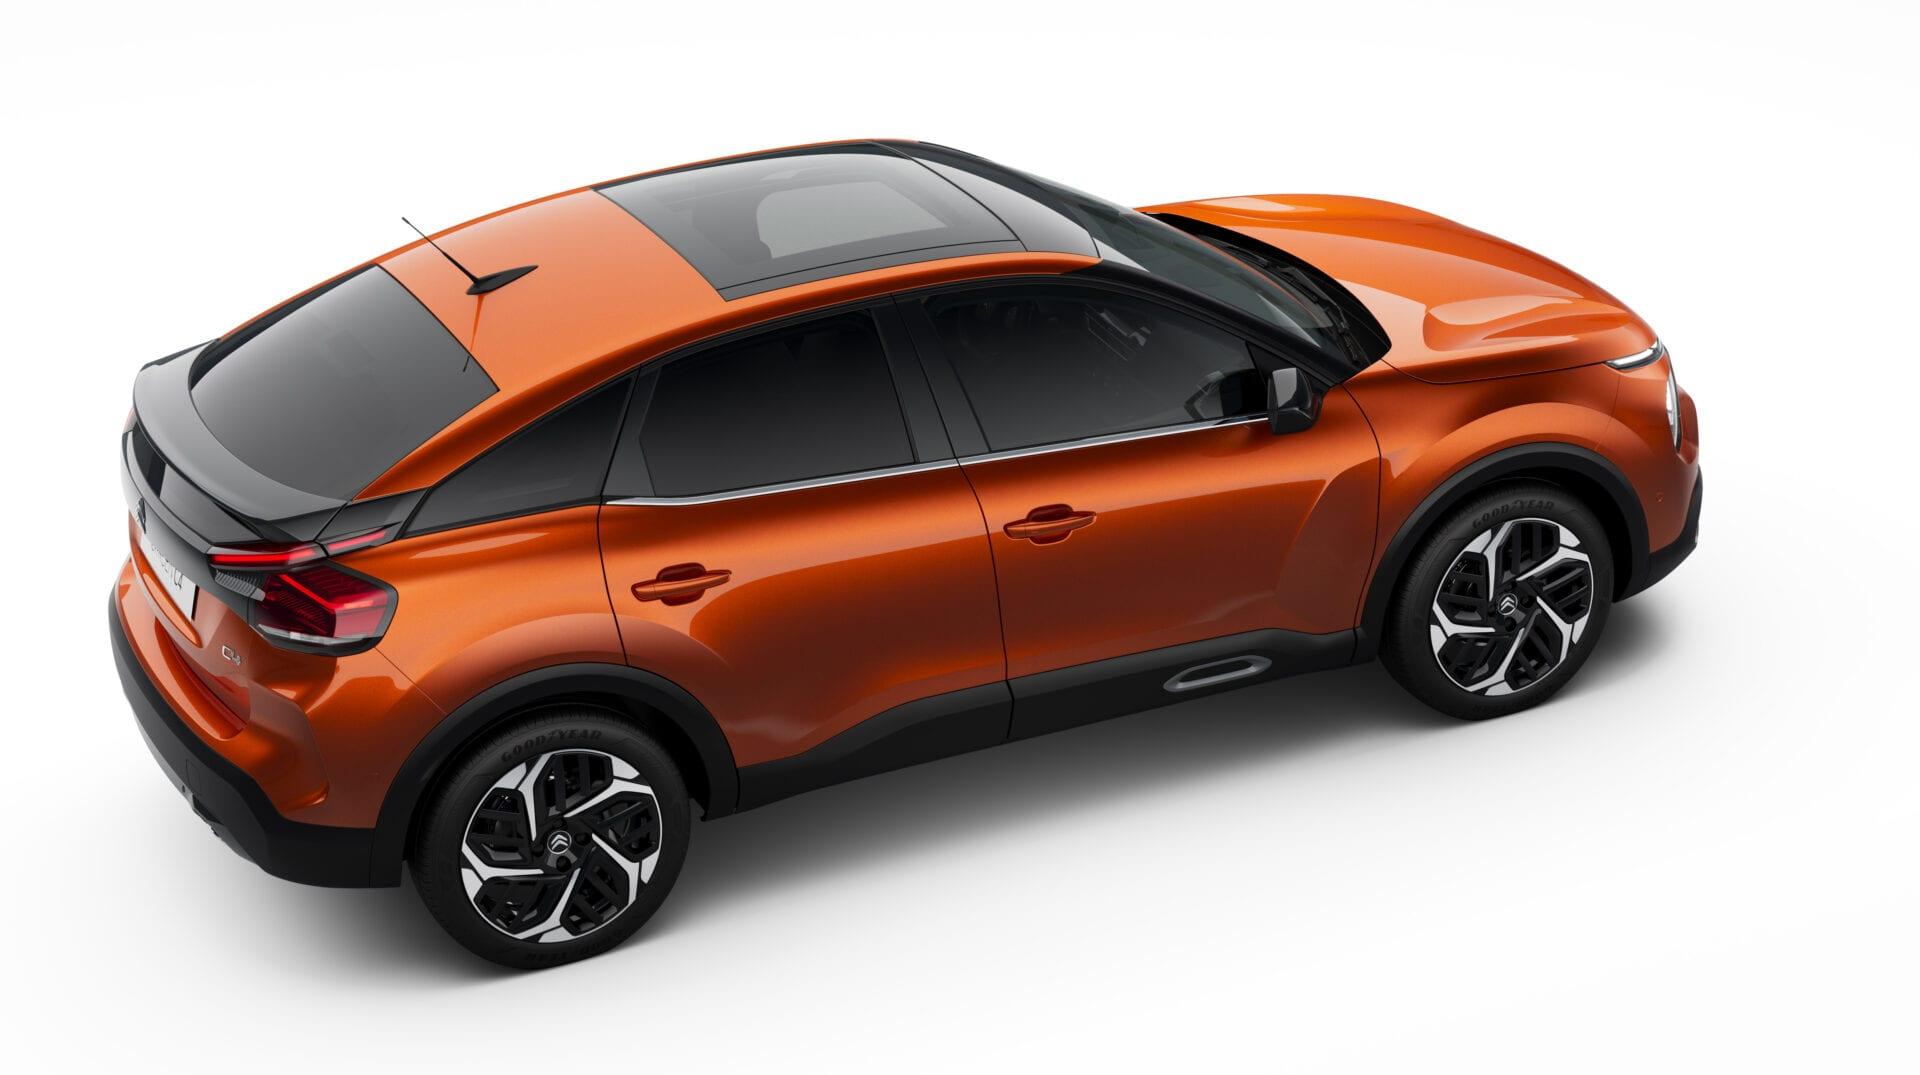 2021 Citroën C4 & ë-C4